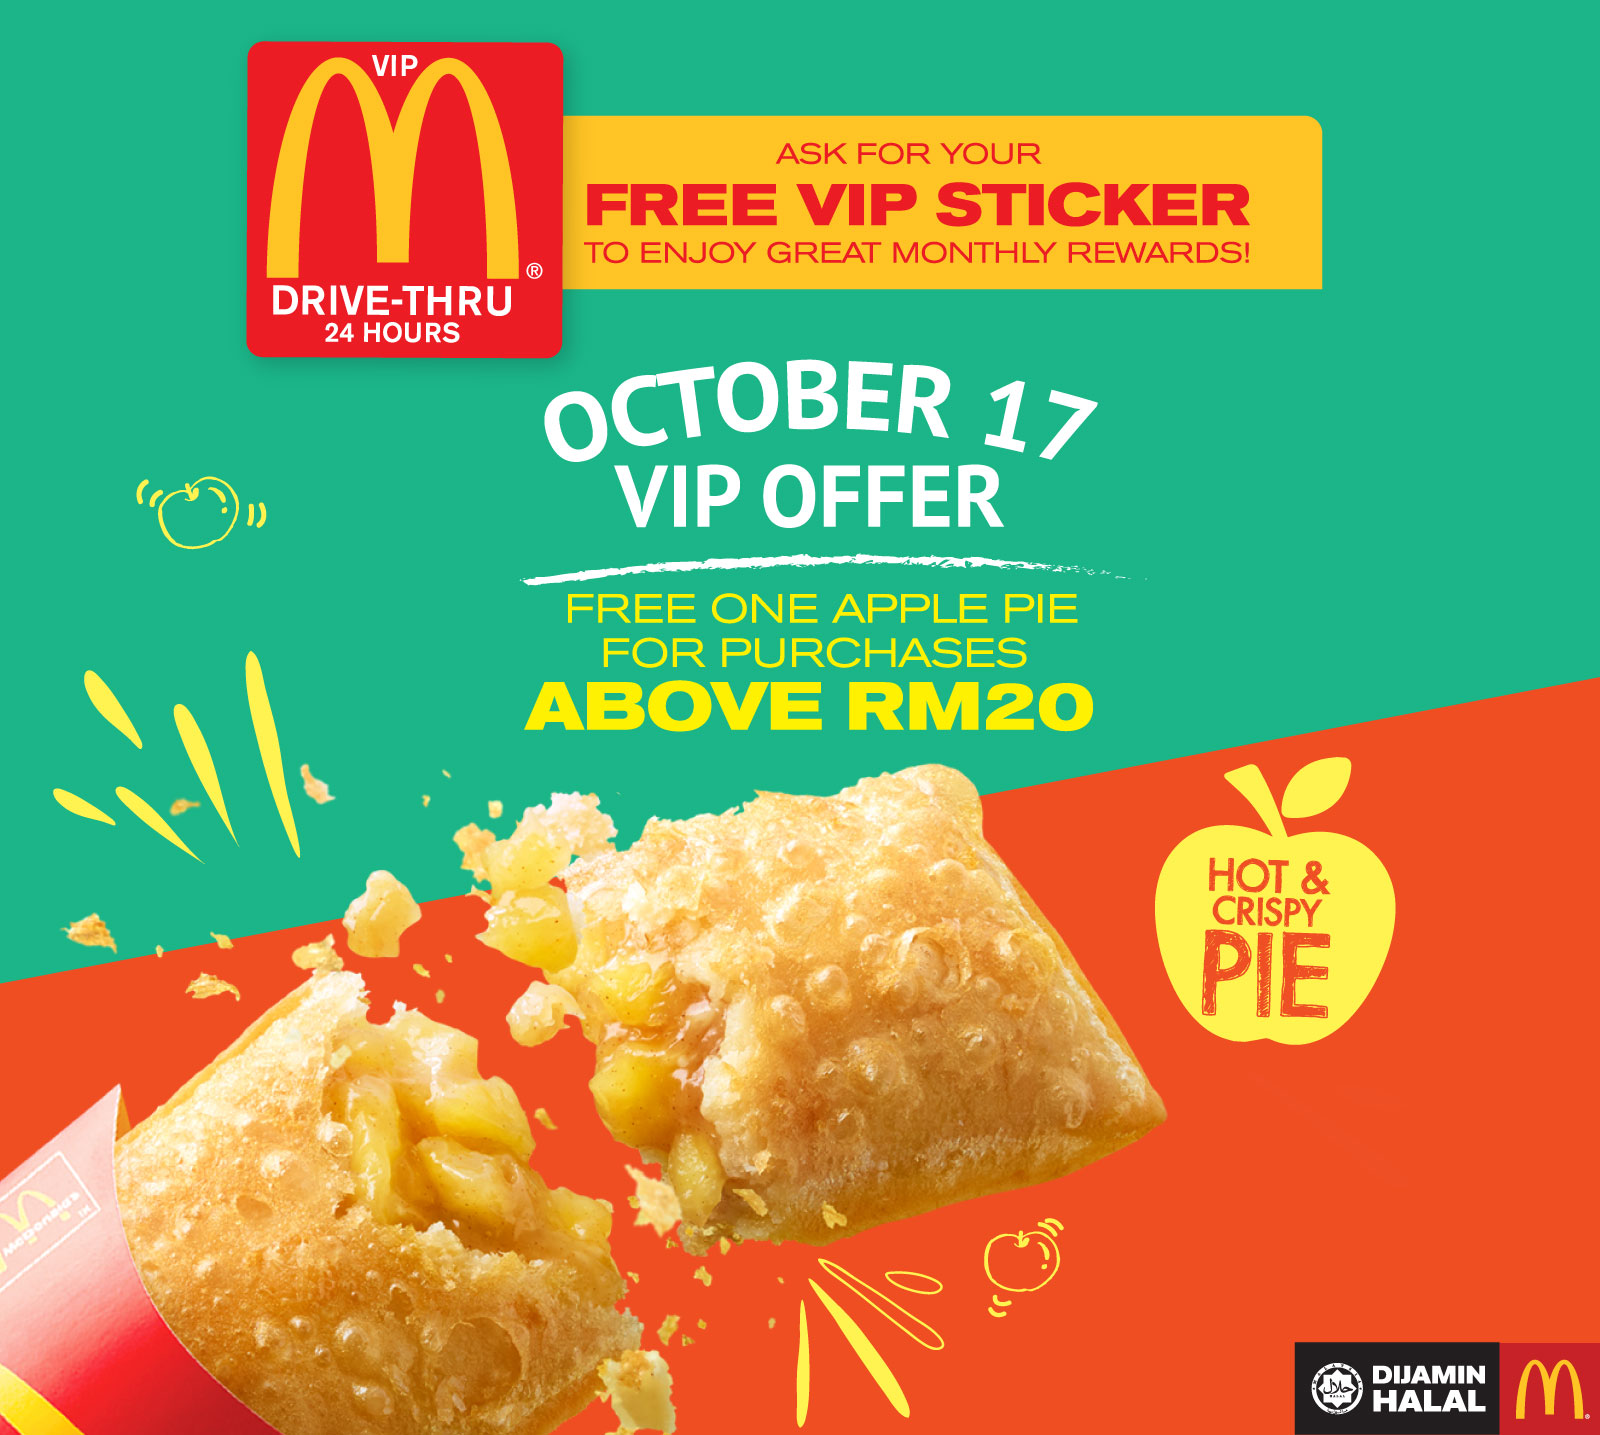 McD Drive Thru VIP FREE Apple Pie Minimum Purchase RM20 Until 31 October 2017